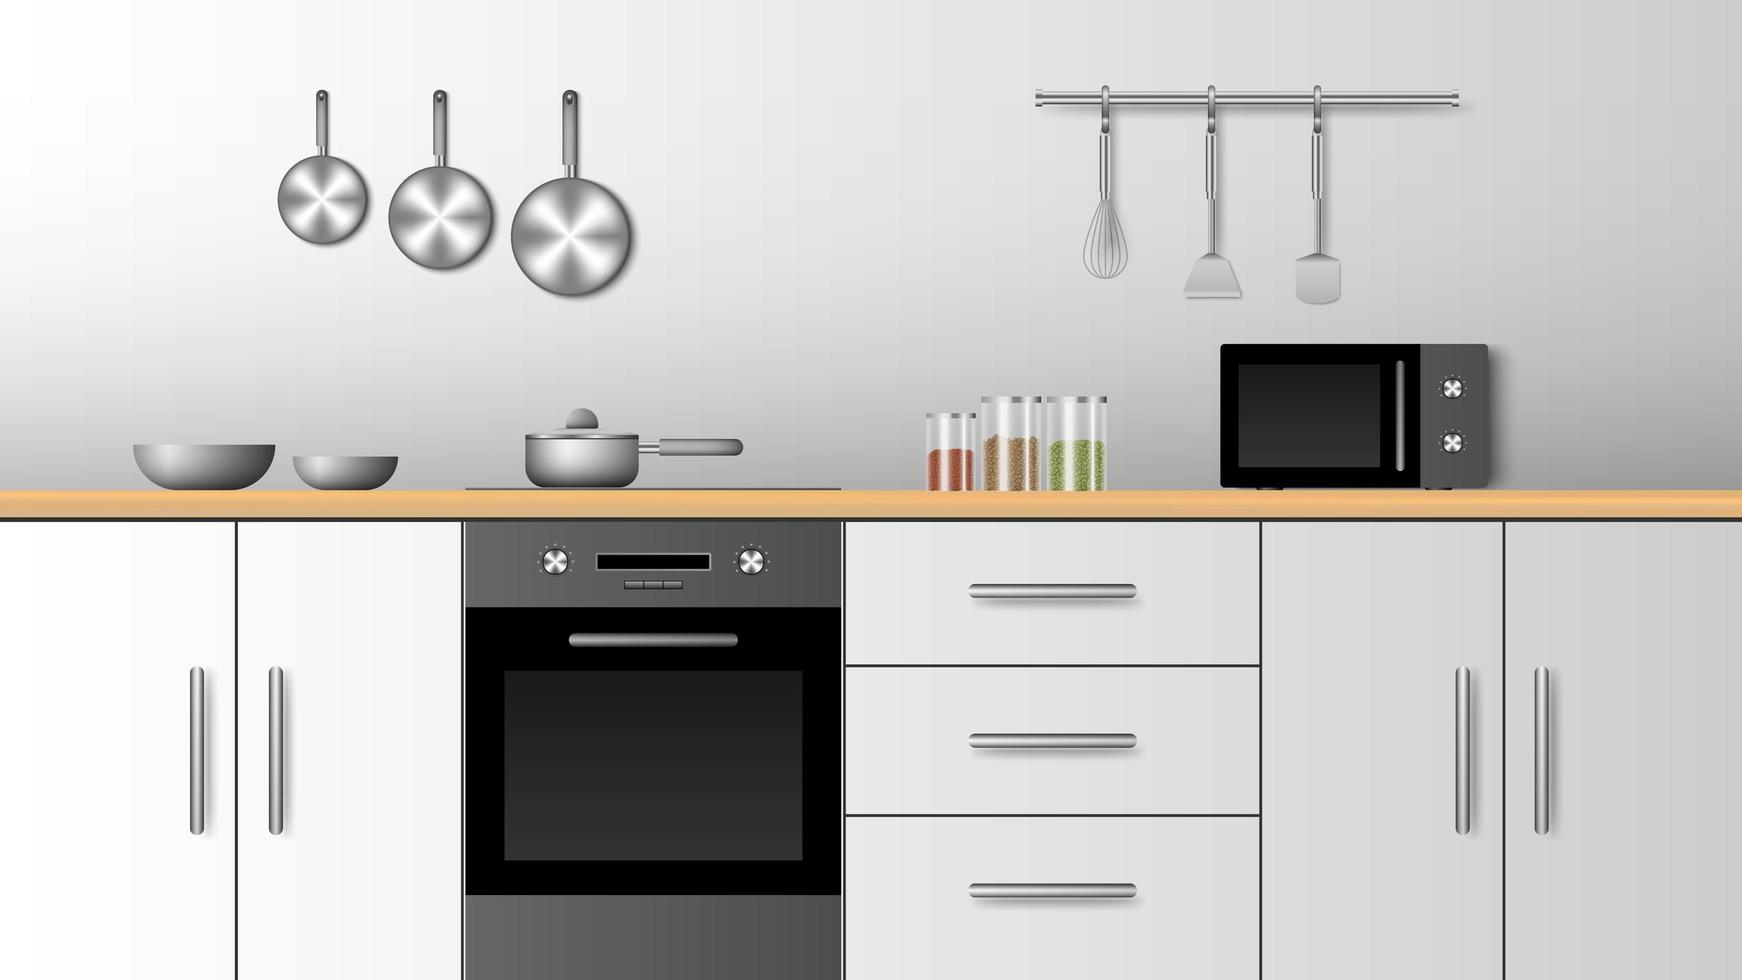 realistisk modern inredning av köket vektor